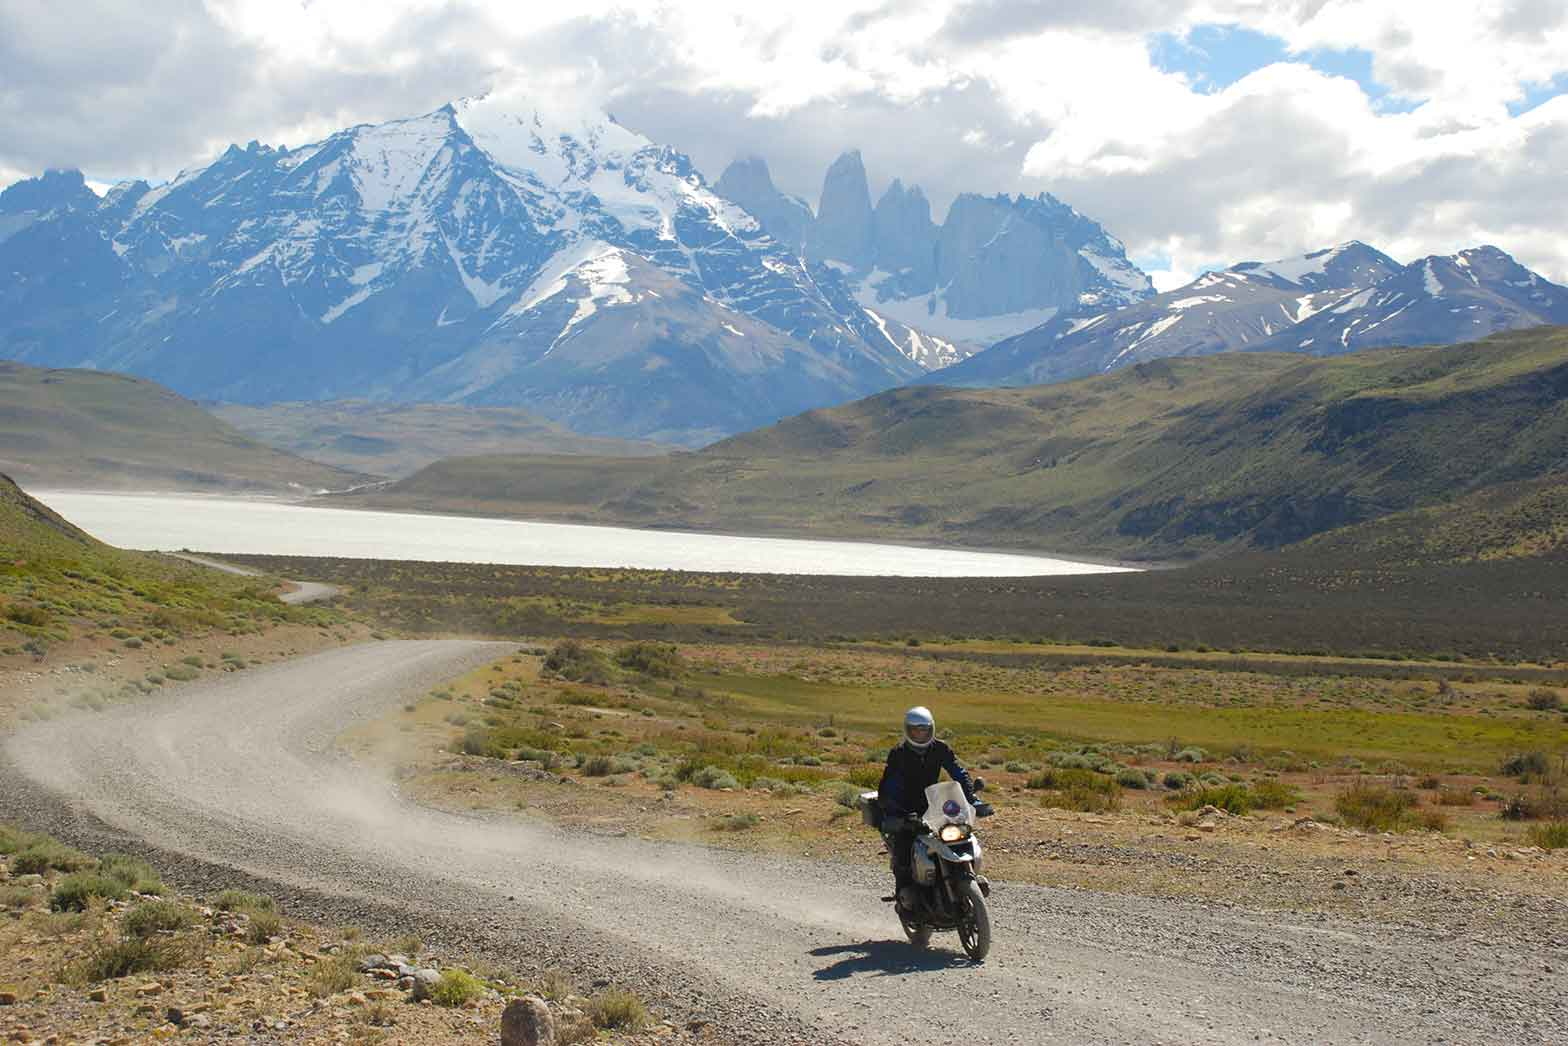 Patagonian scenery